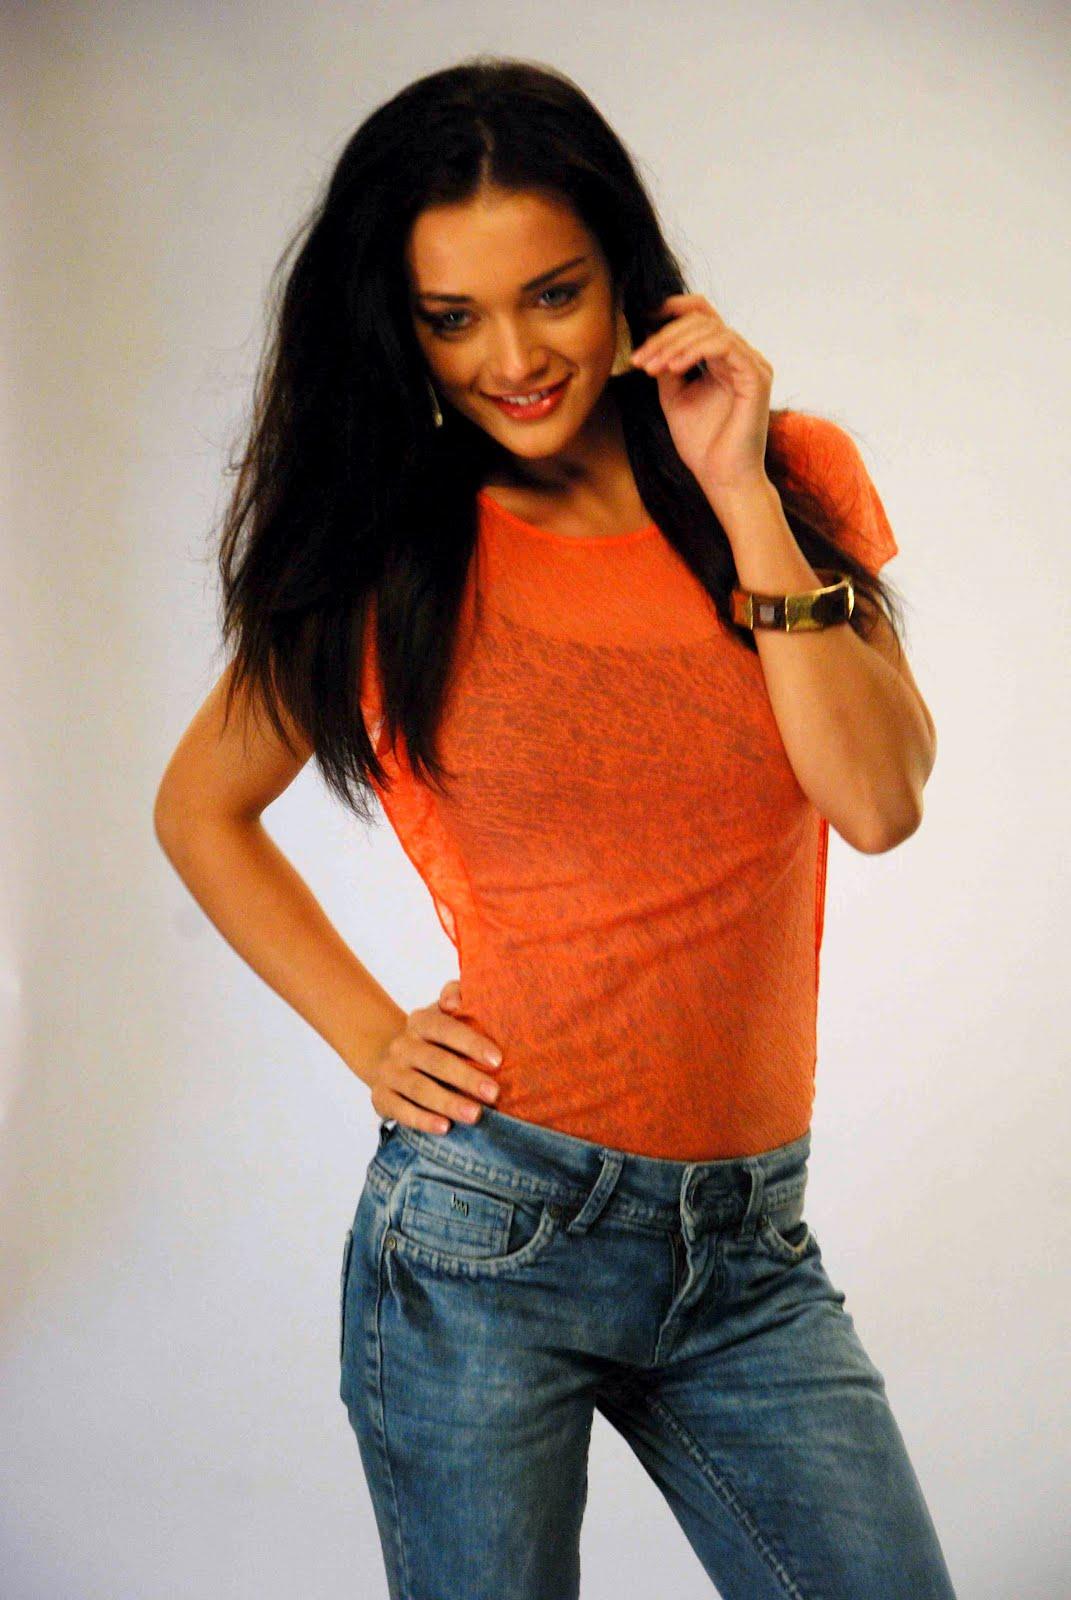 Sunny Leone Very Hot Sex Video